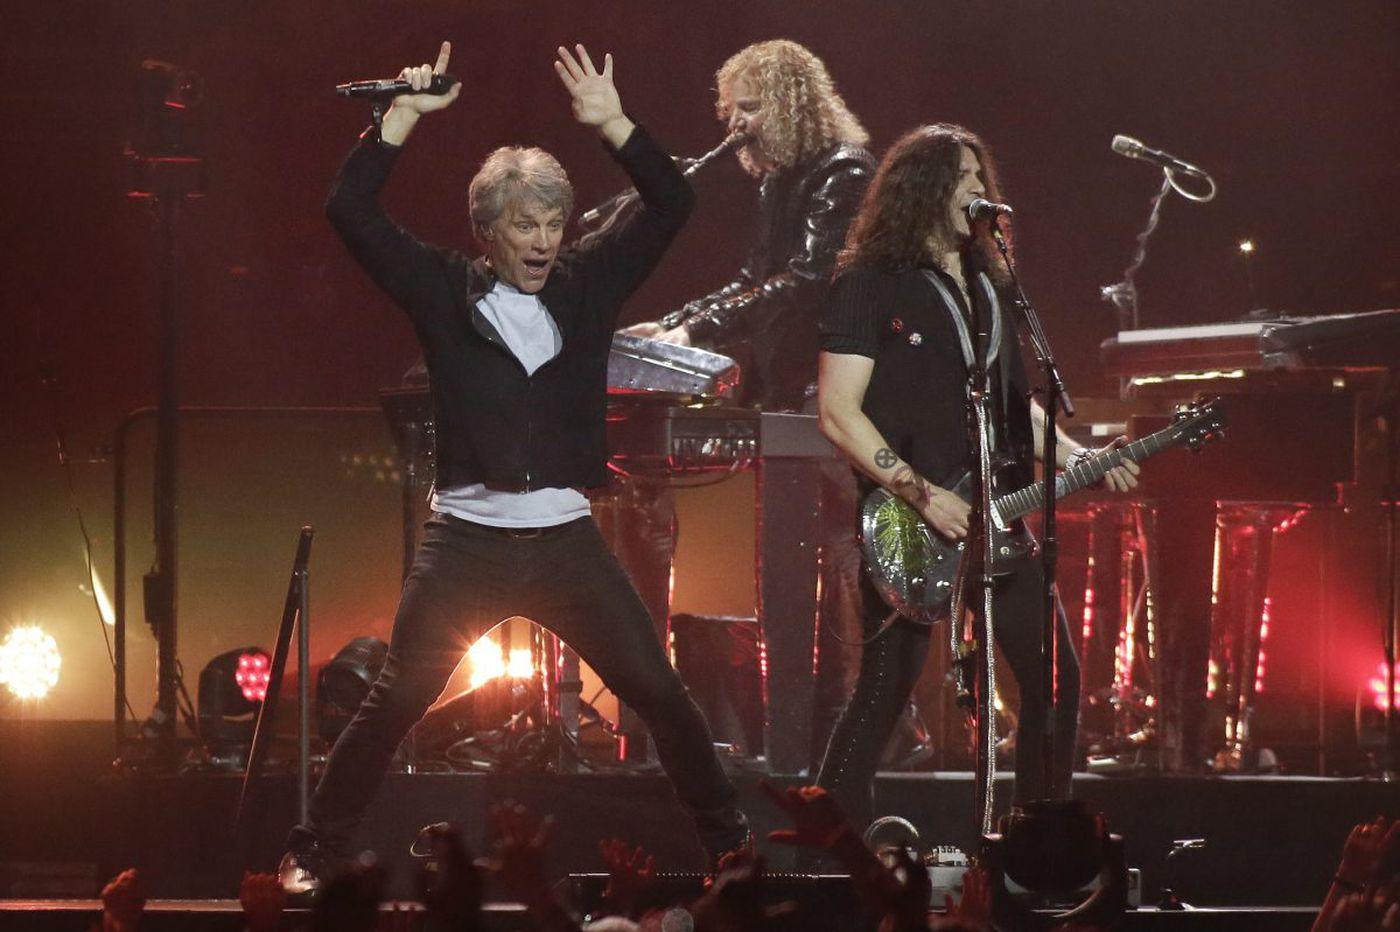 Bon Jovi celebrates WMMR's 50th birthday at the Wells Fargo Center